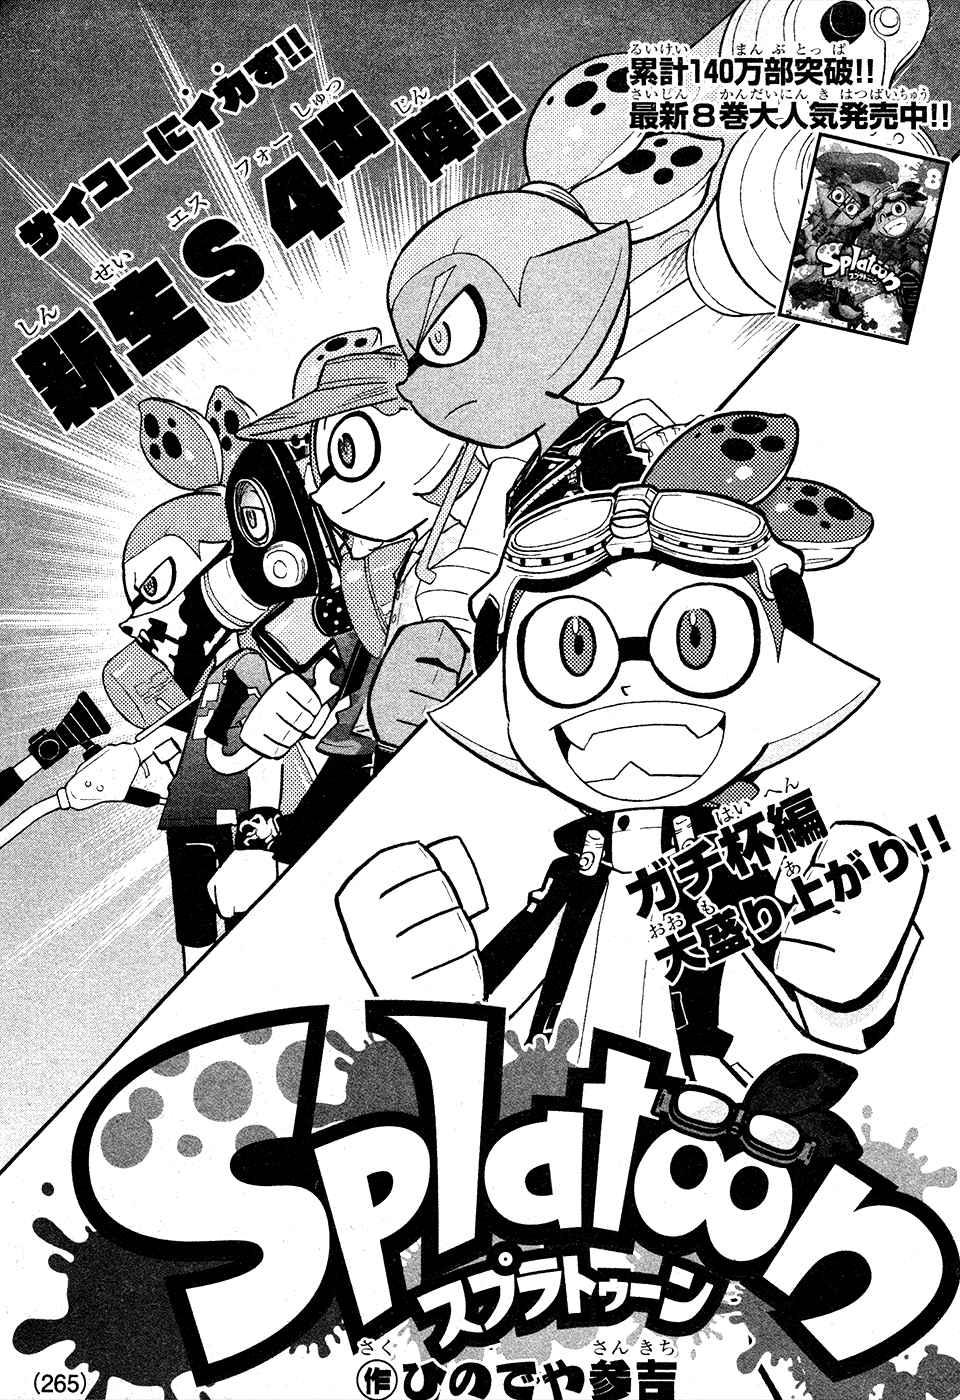 https://img2.nineanime.com/comics/pic2/60/22140/620282/b304cd26ef732f1135b6cc1c6d340ee5.jpg Page 1